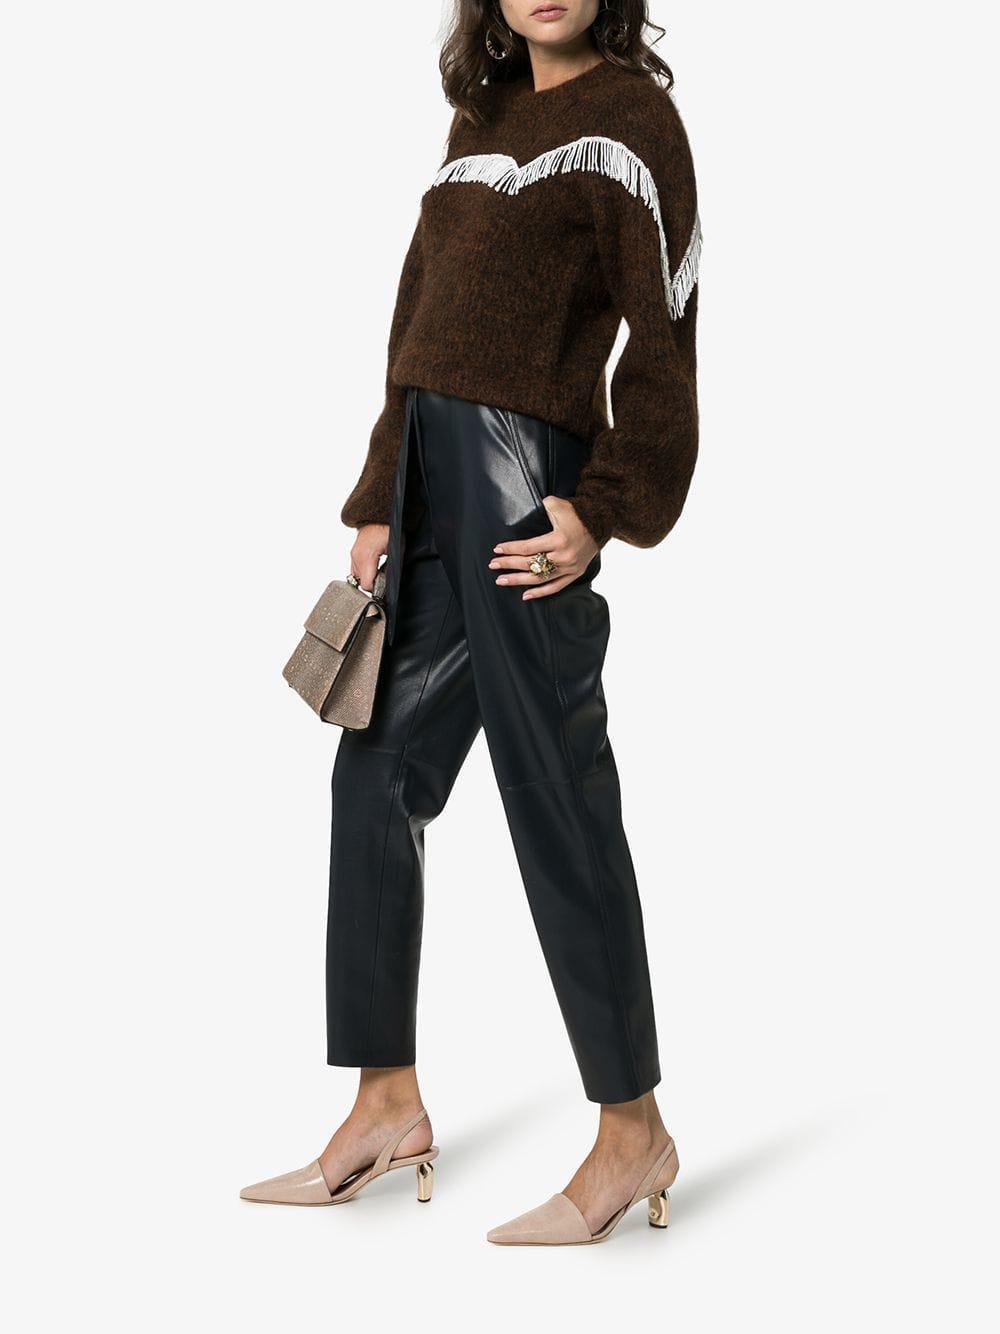 ca2eb0850b4 Lyst - Rejina Pyo Beige Connie 20 Metal Heel Leather Slingbacks - Save 7%